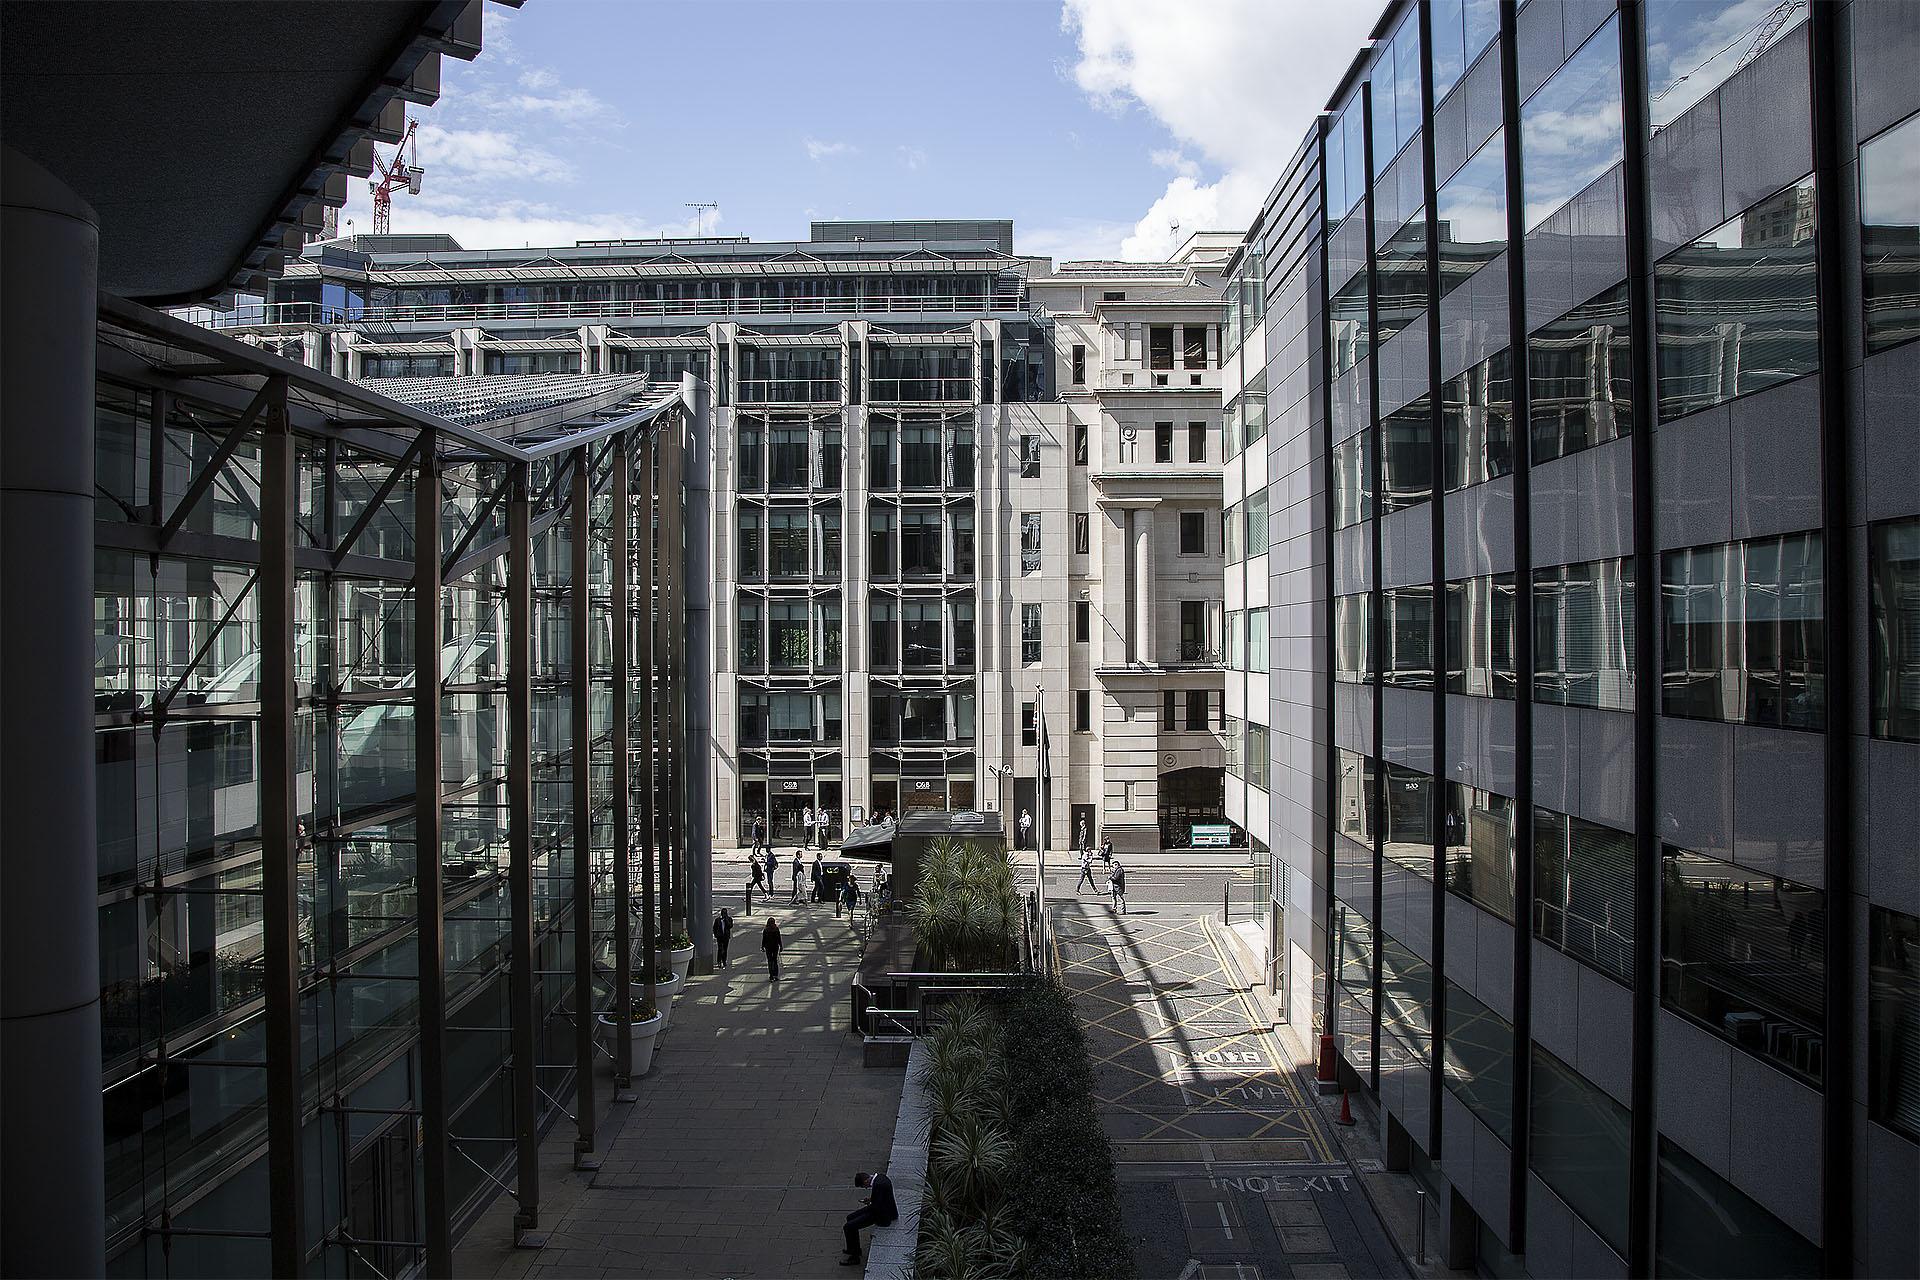 Behind the façade, London